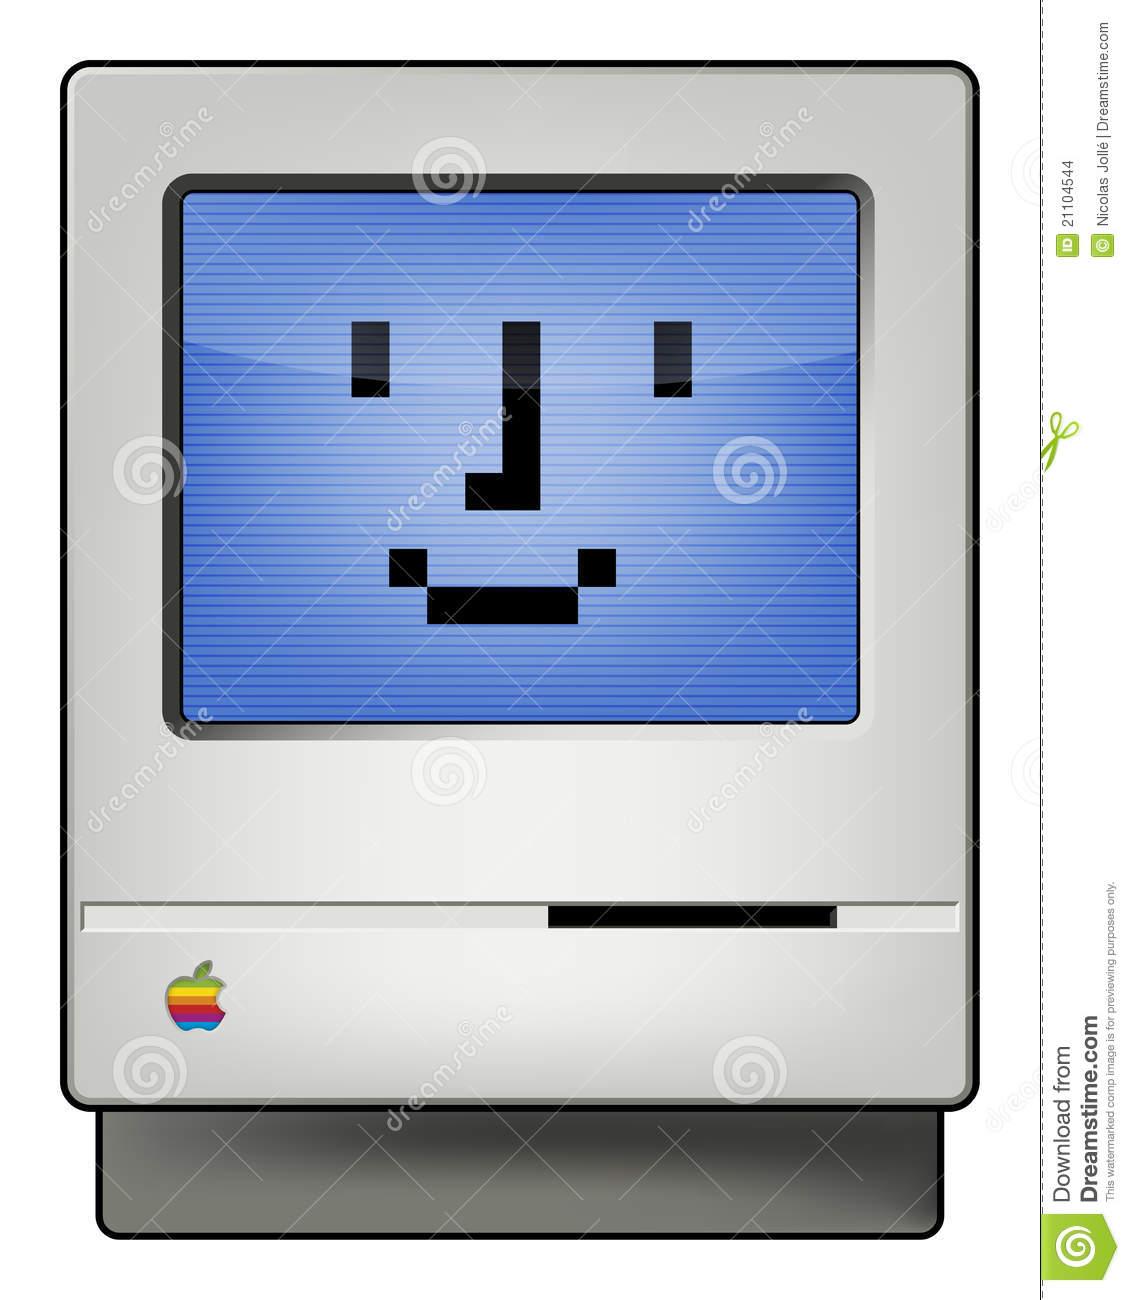 1130x1300 Free Clip Art For Mac